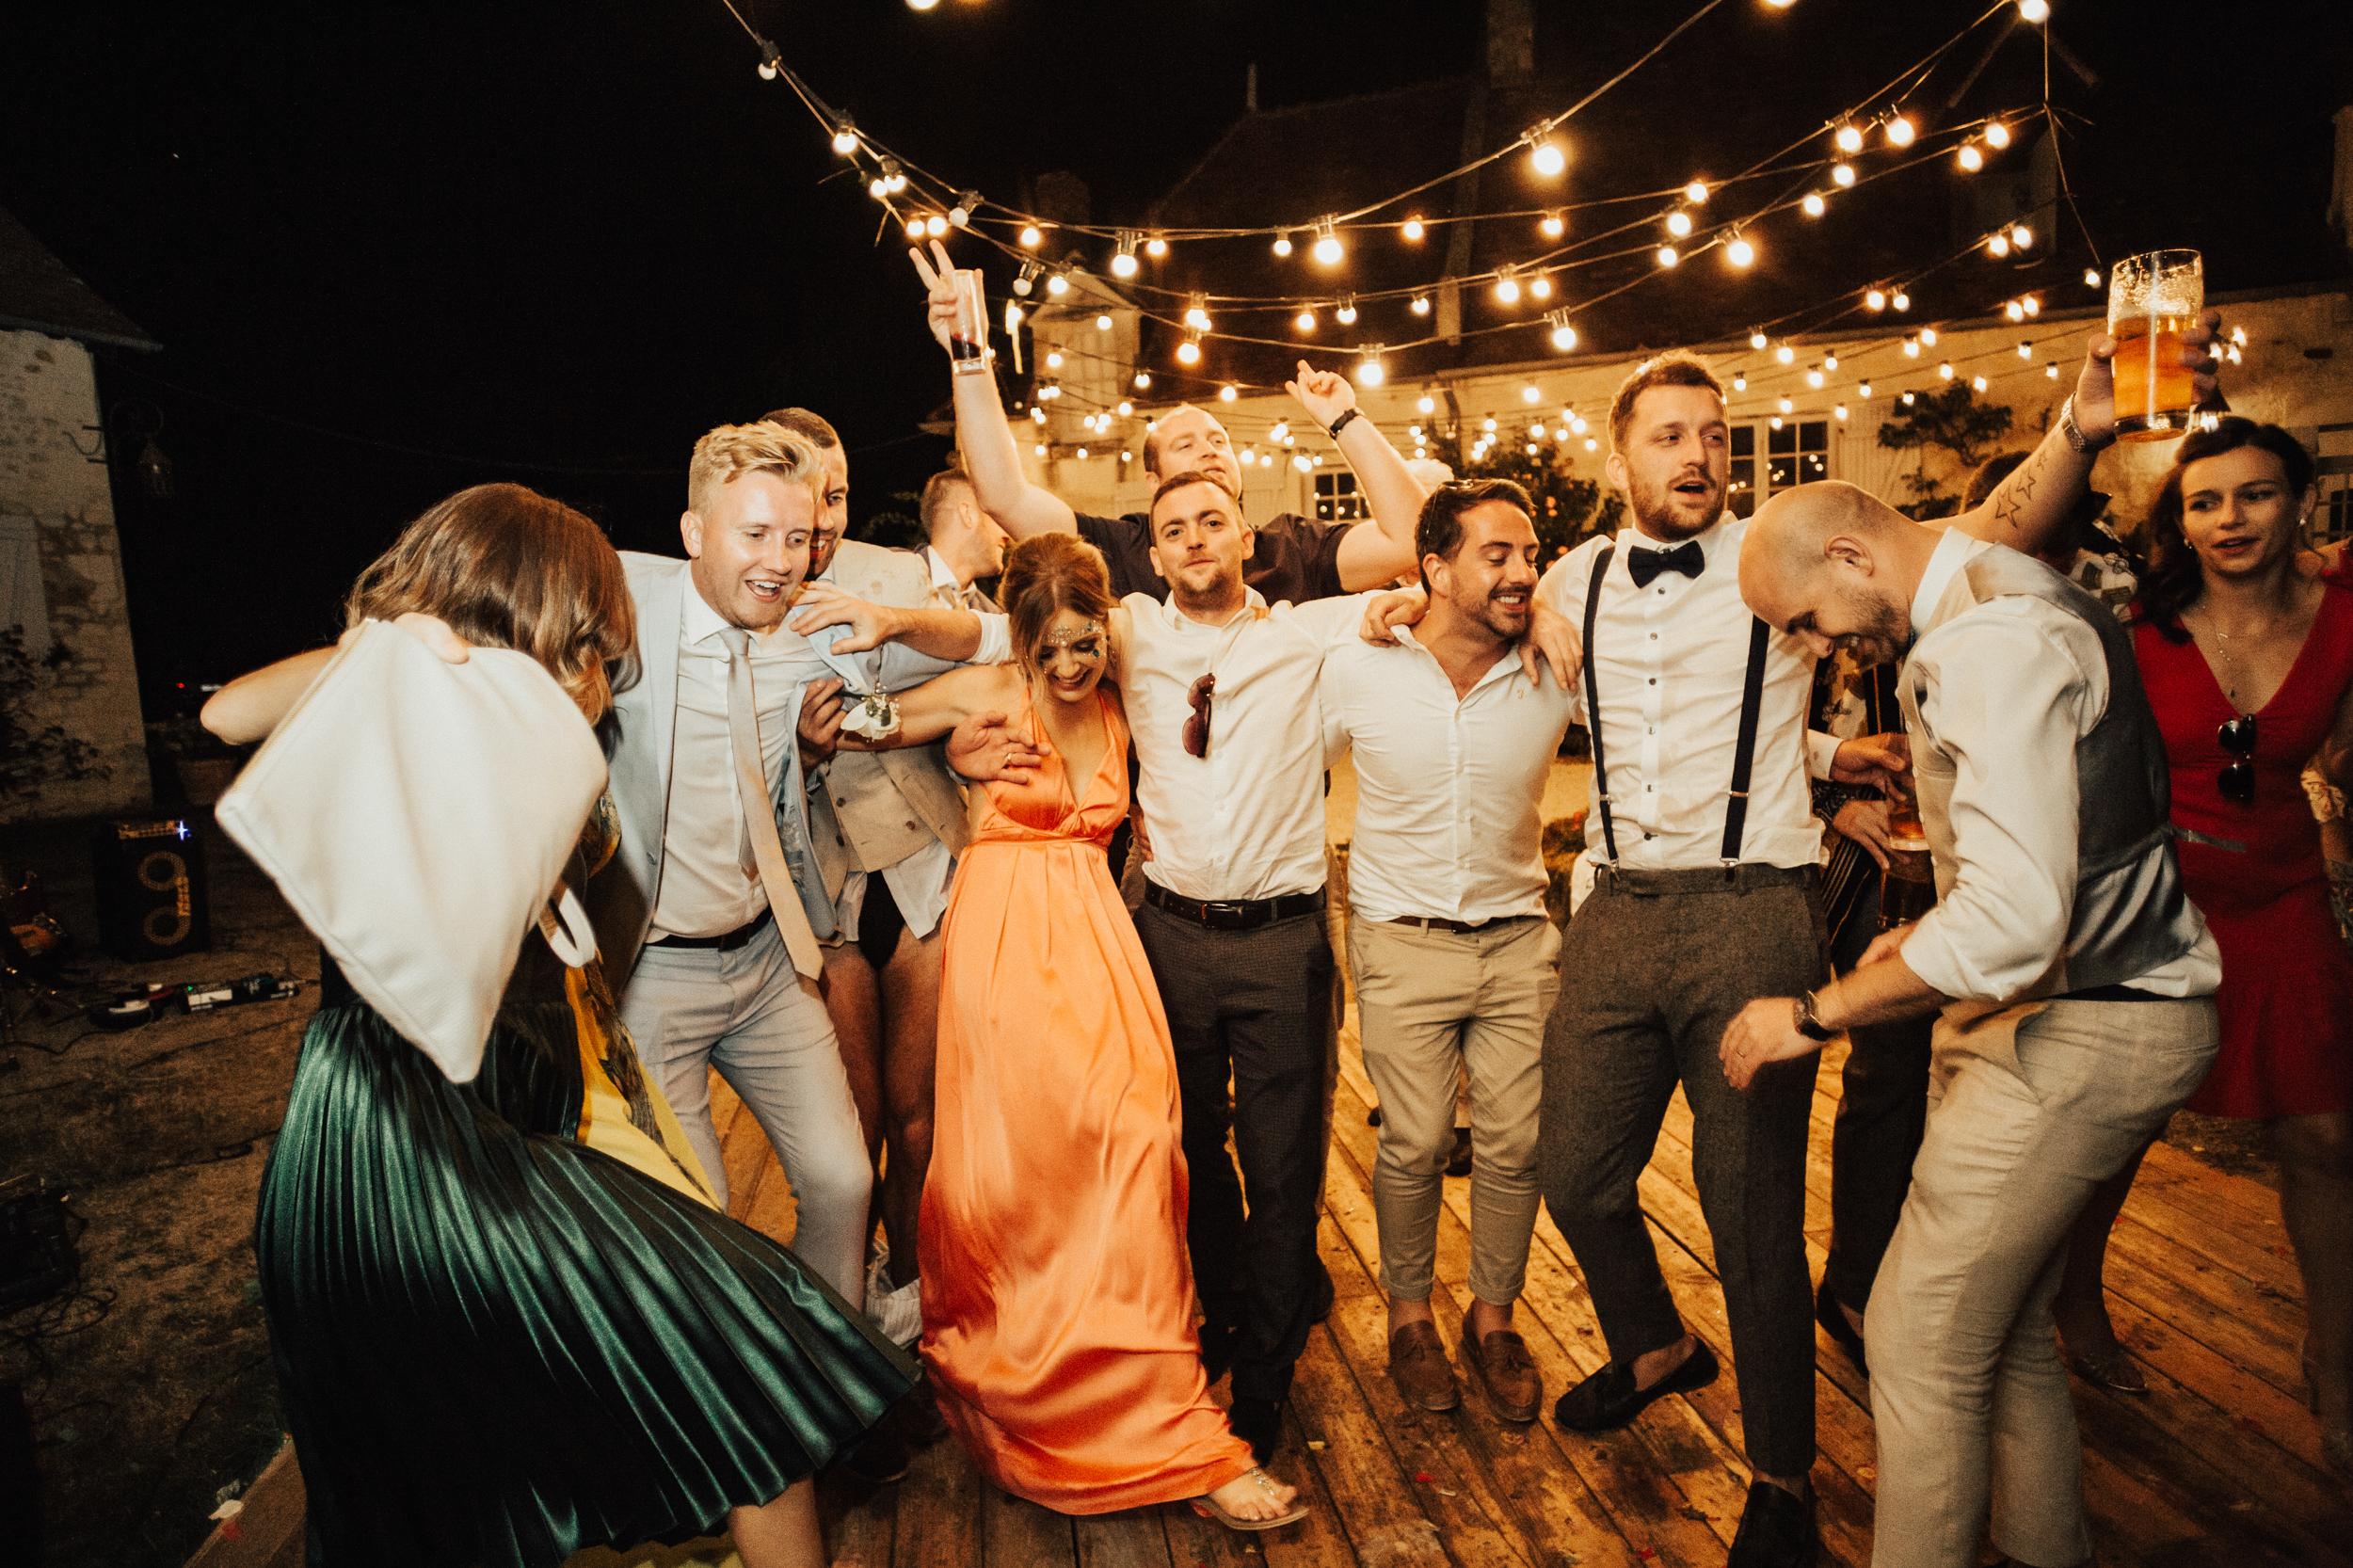 Amy-Zac-Destination-Wedding-France-Manoir-Foulquetiere-Darina-Stoda-Photography-126.jpg